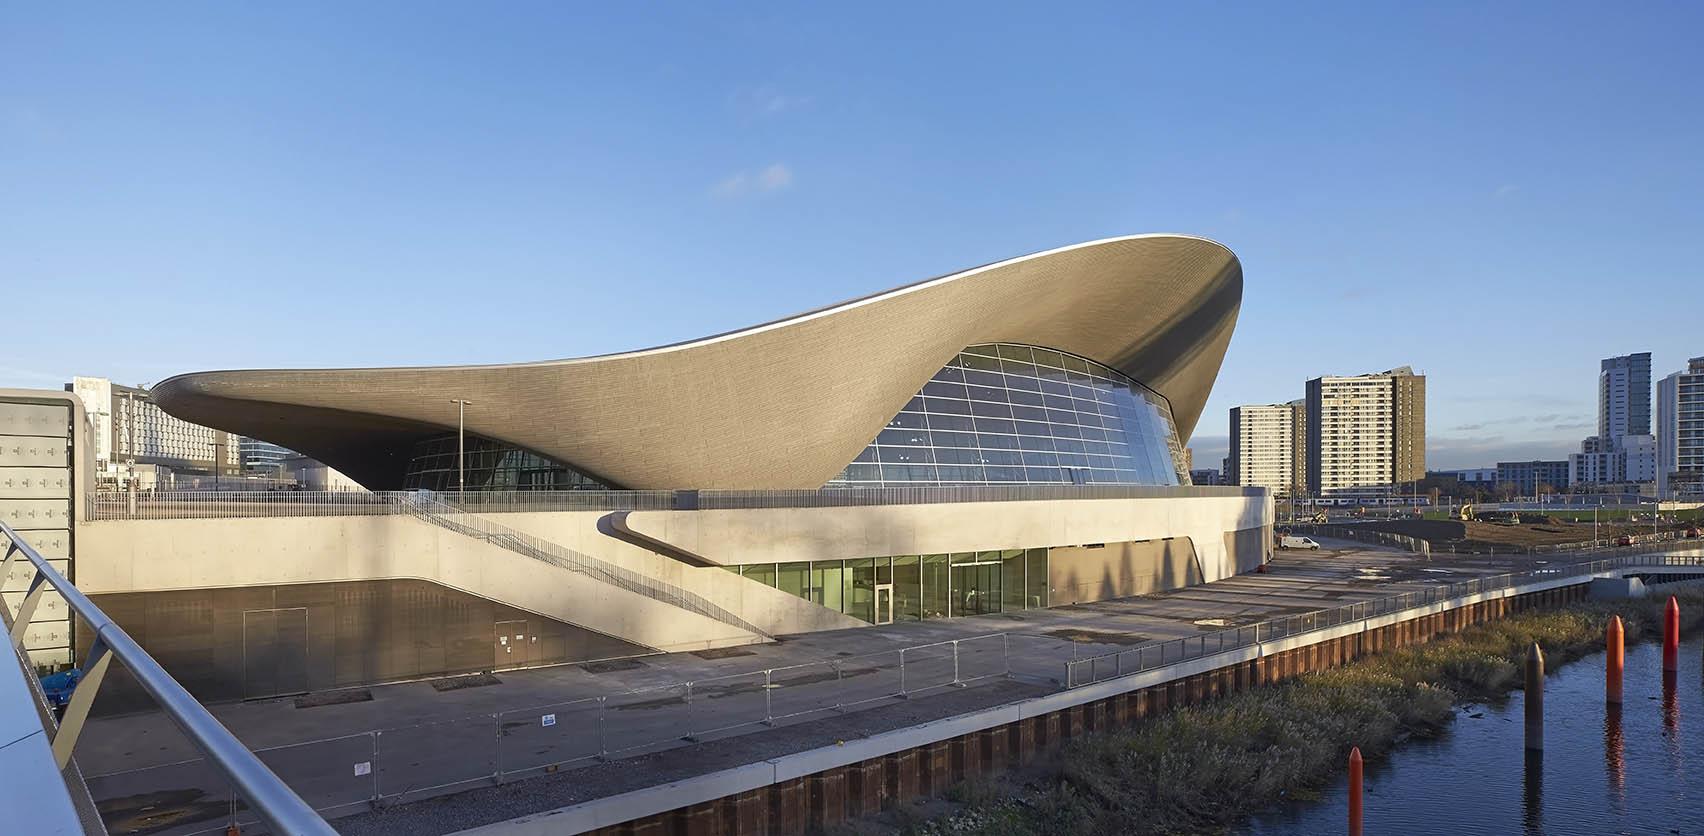 London Aquatics Center | The Architects Journal